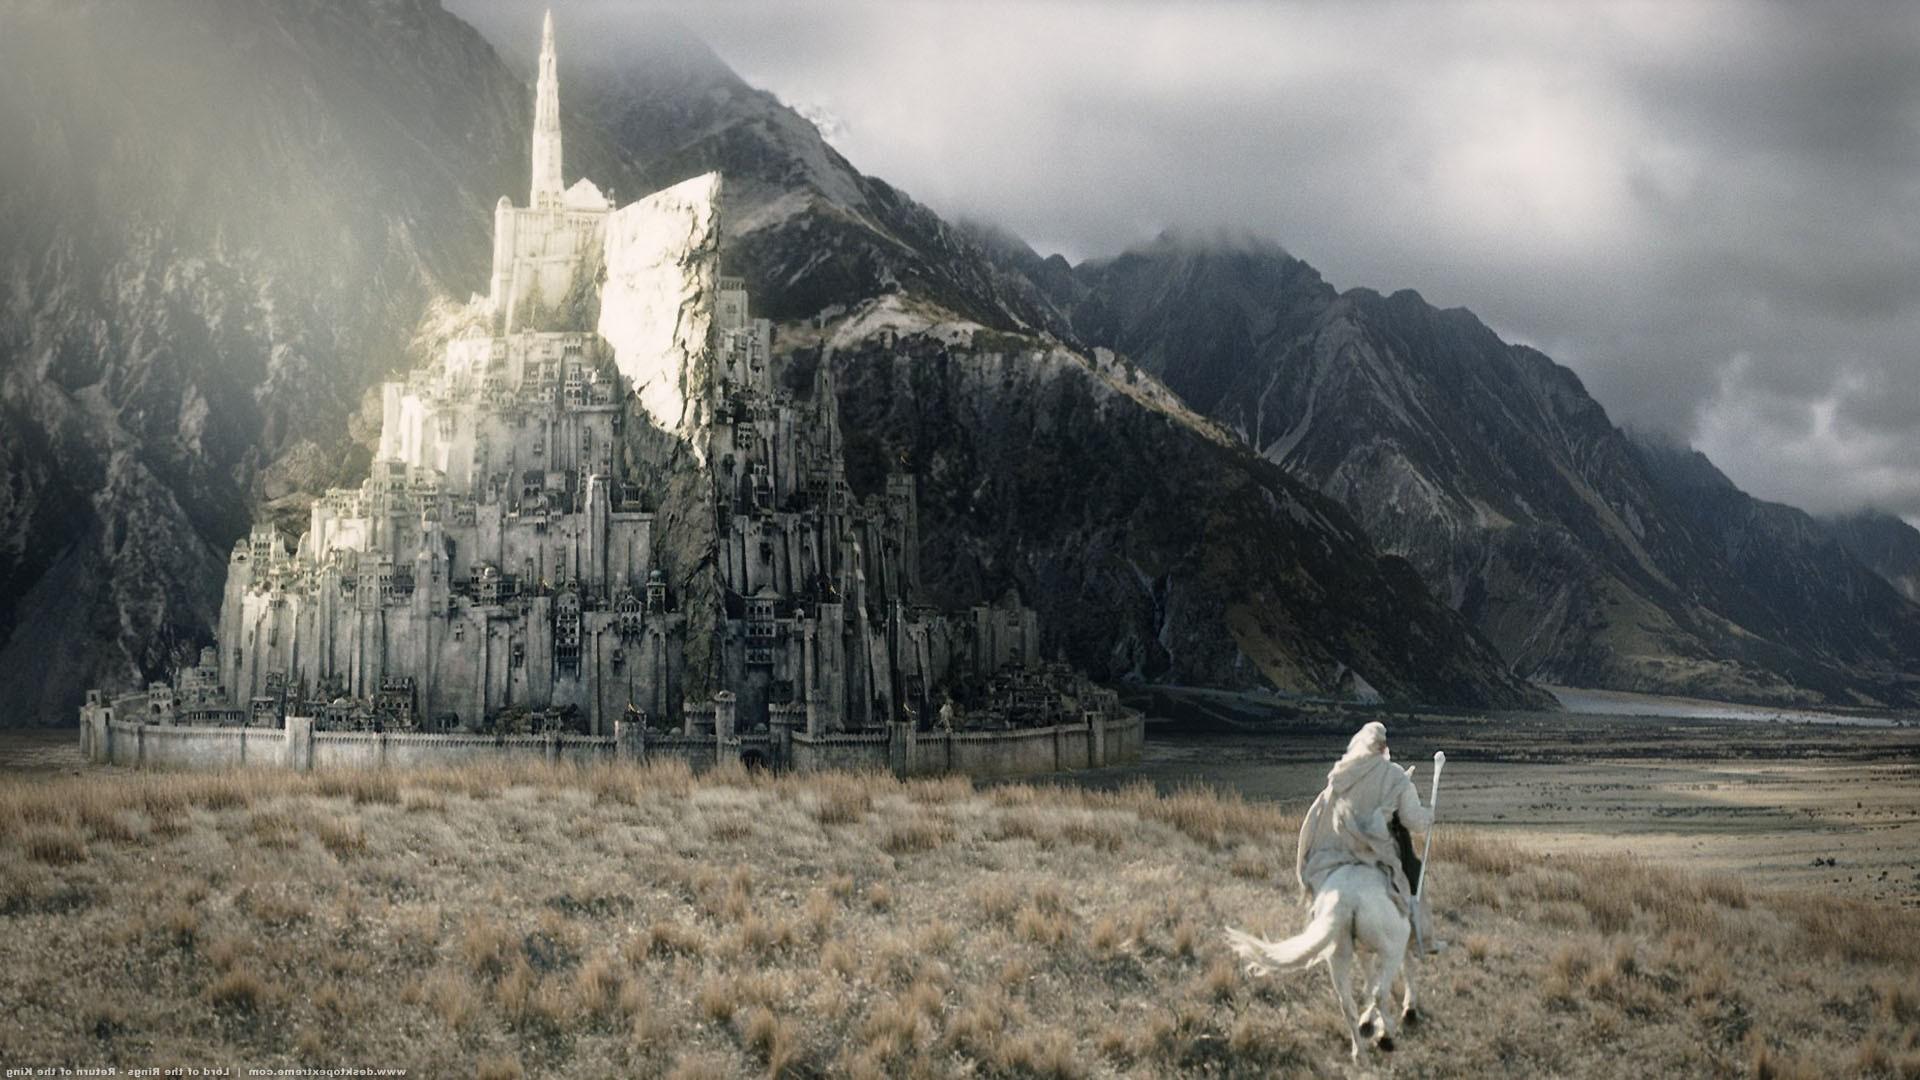 Wallpaper 1920x1080 Px Building City Gandalf Minas